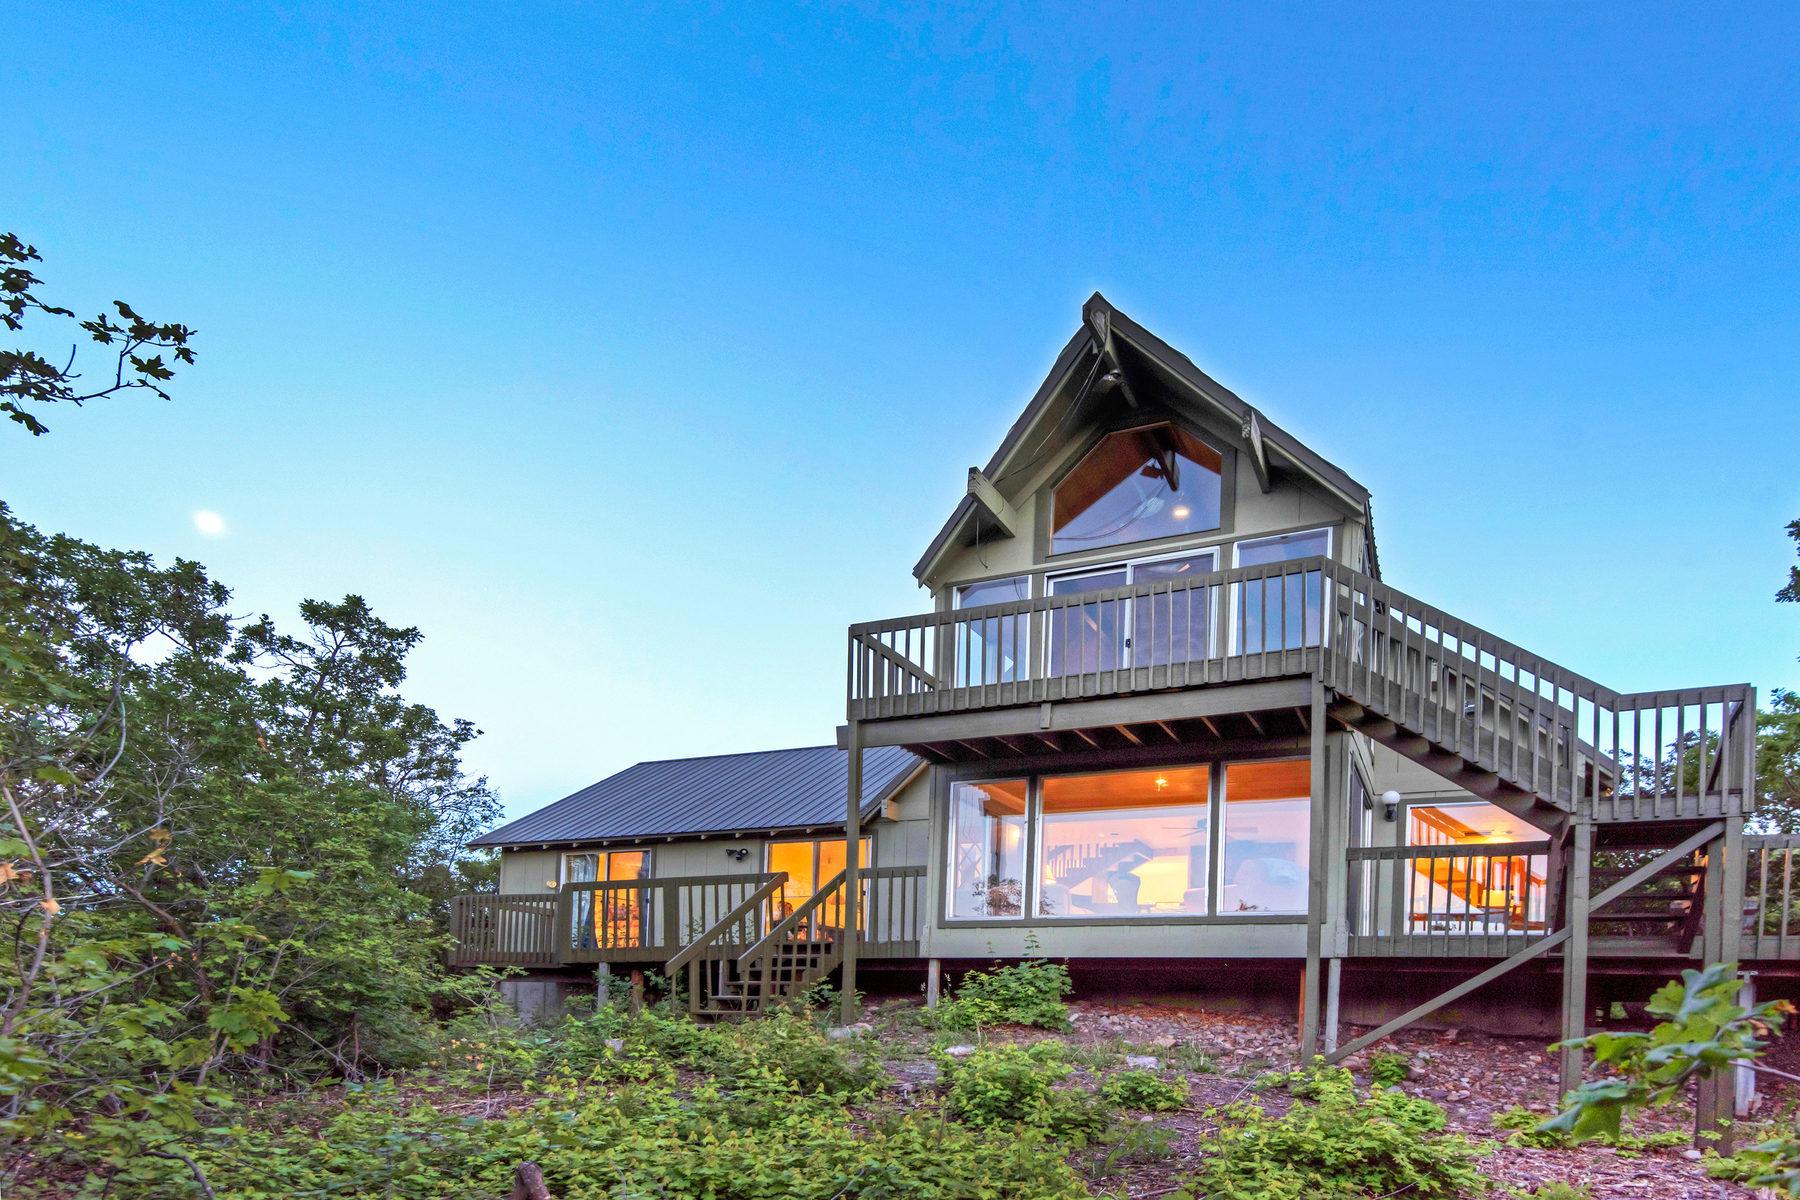 独户住宅 为 销售 在 Eagles Peak Mountain Retreat 5762 Old Snow Basin Rd 亨茨维尔, 犹他州, 84317 美国